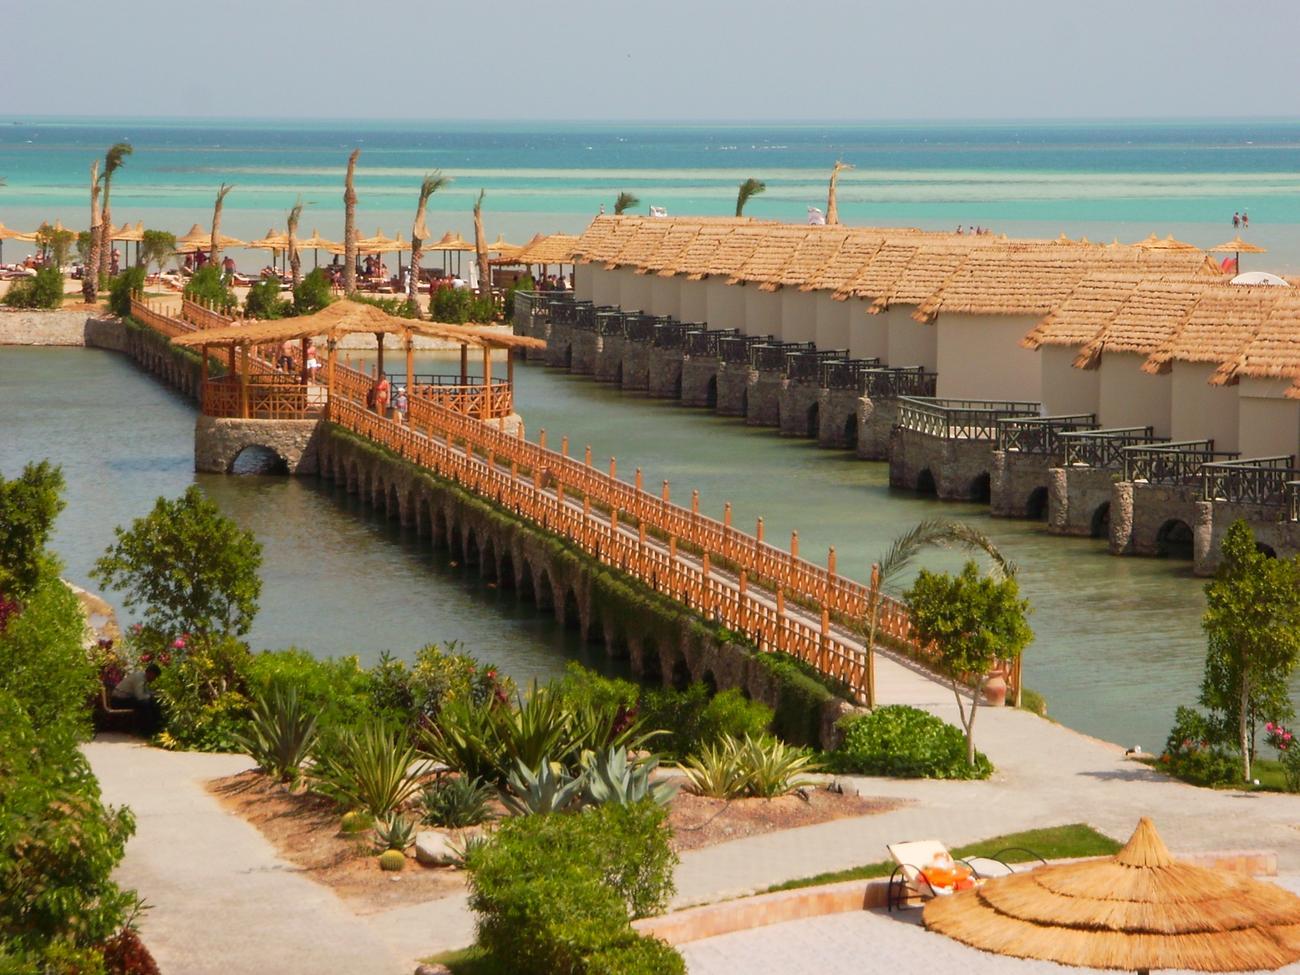 Hotel panorama bungalows hurghada hurghada egipt for Hotel panorama